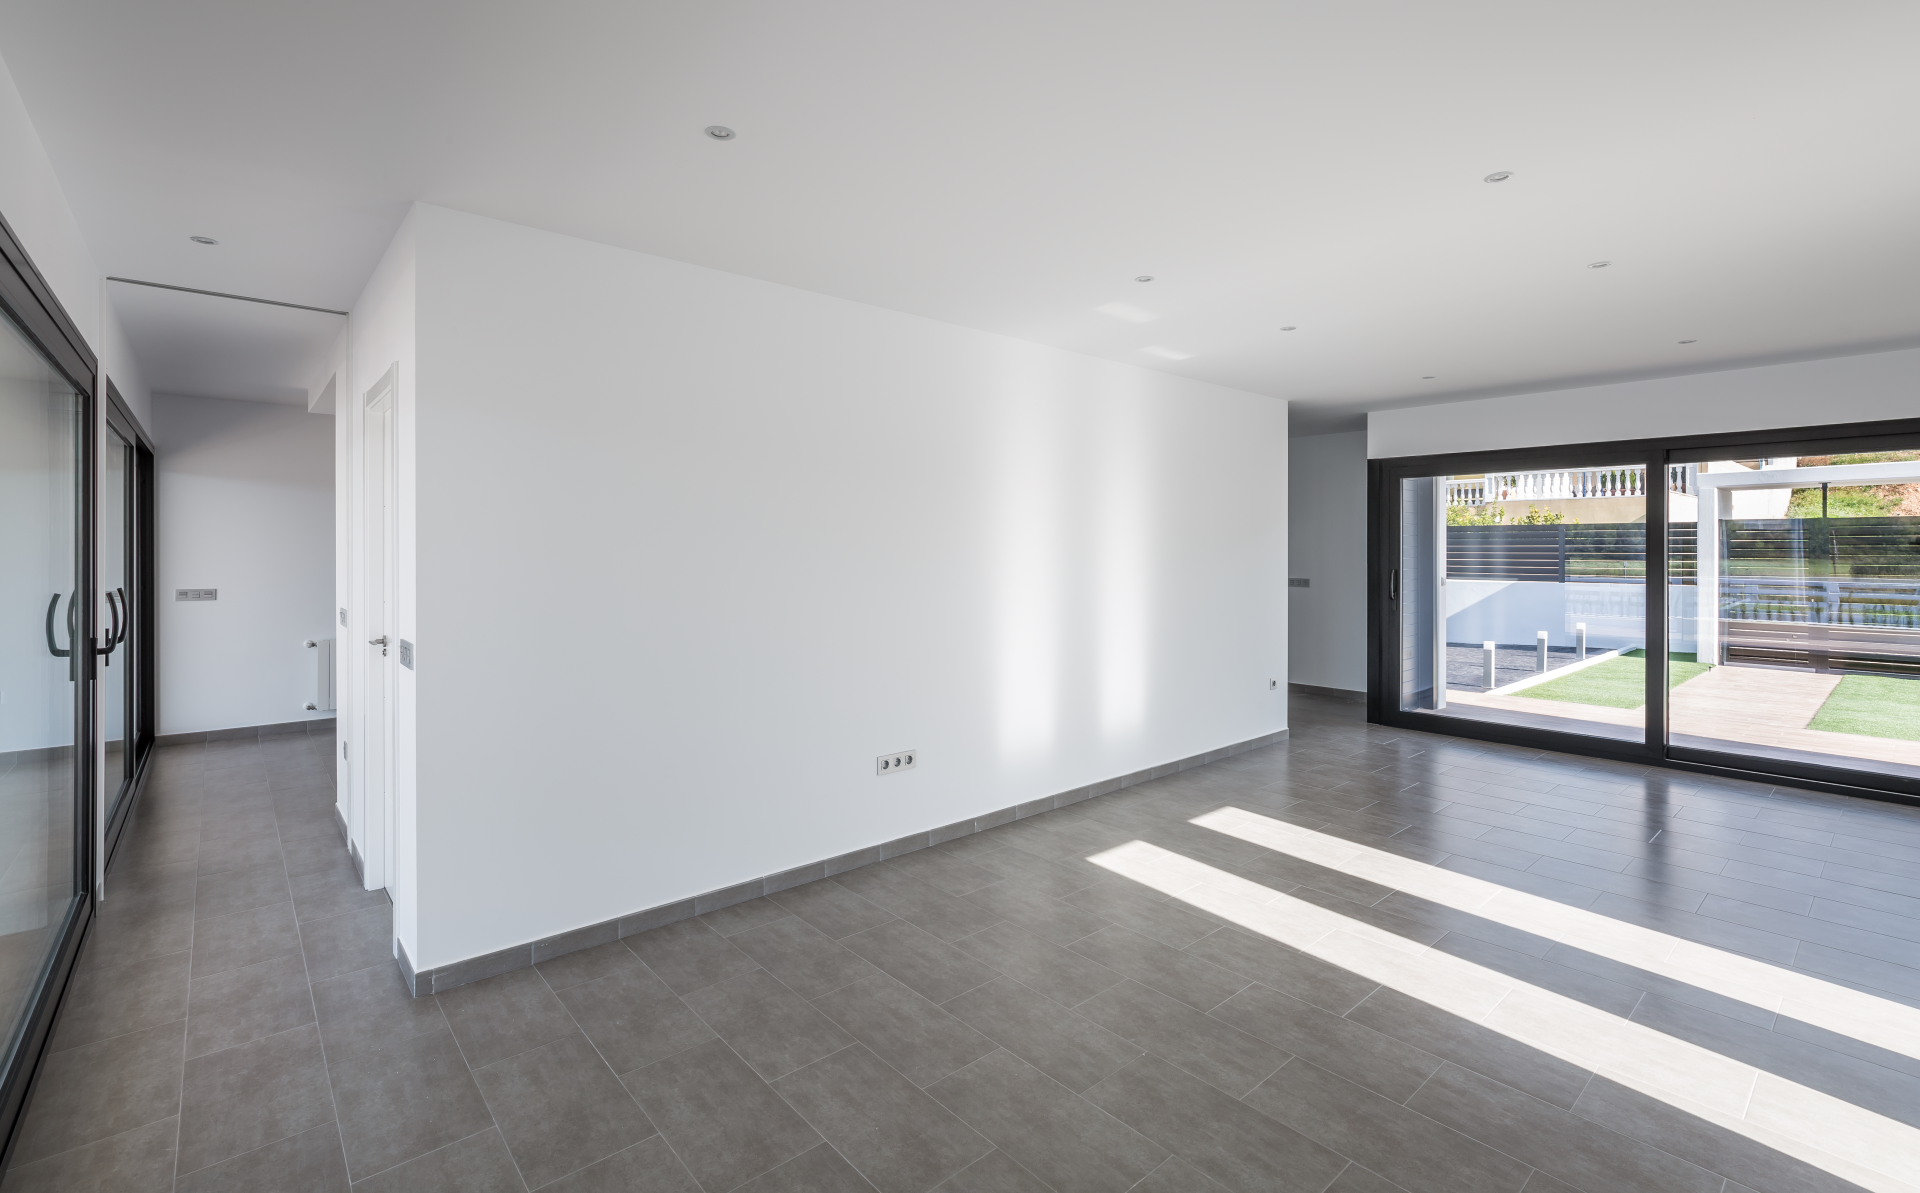 fotografia-arquitectura-valencia-german-cabo-viraje-vivienda-unifamiliar-calpe (21)